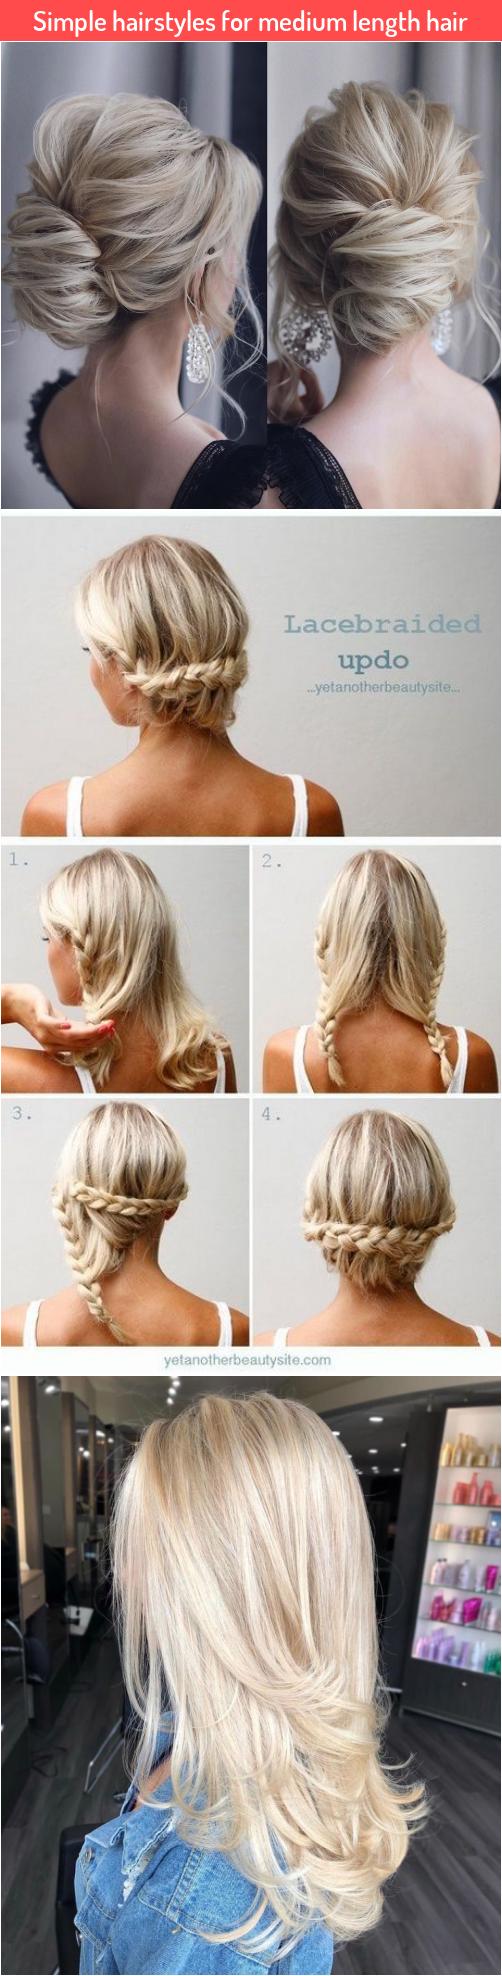 Simple hairstyles for medium length hair in 2020